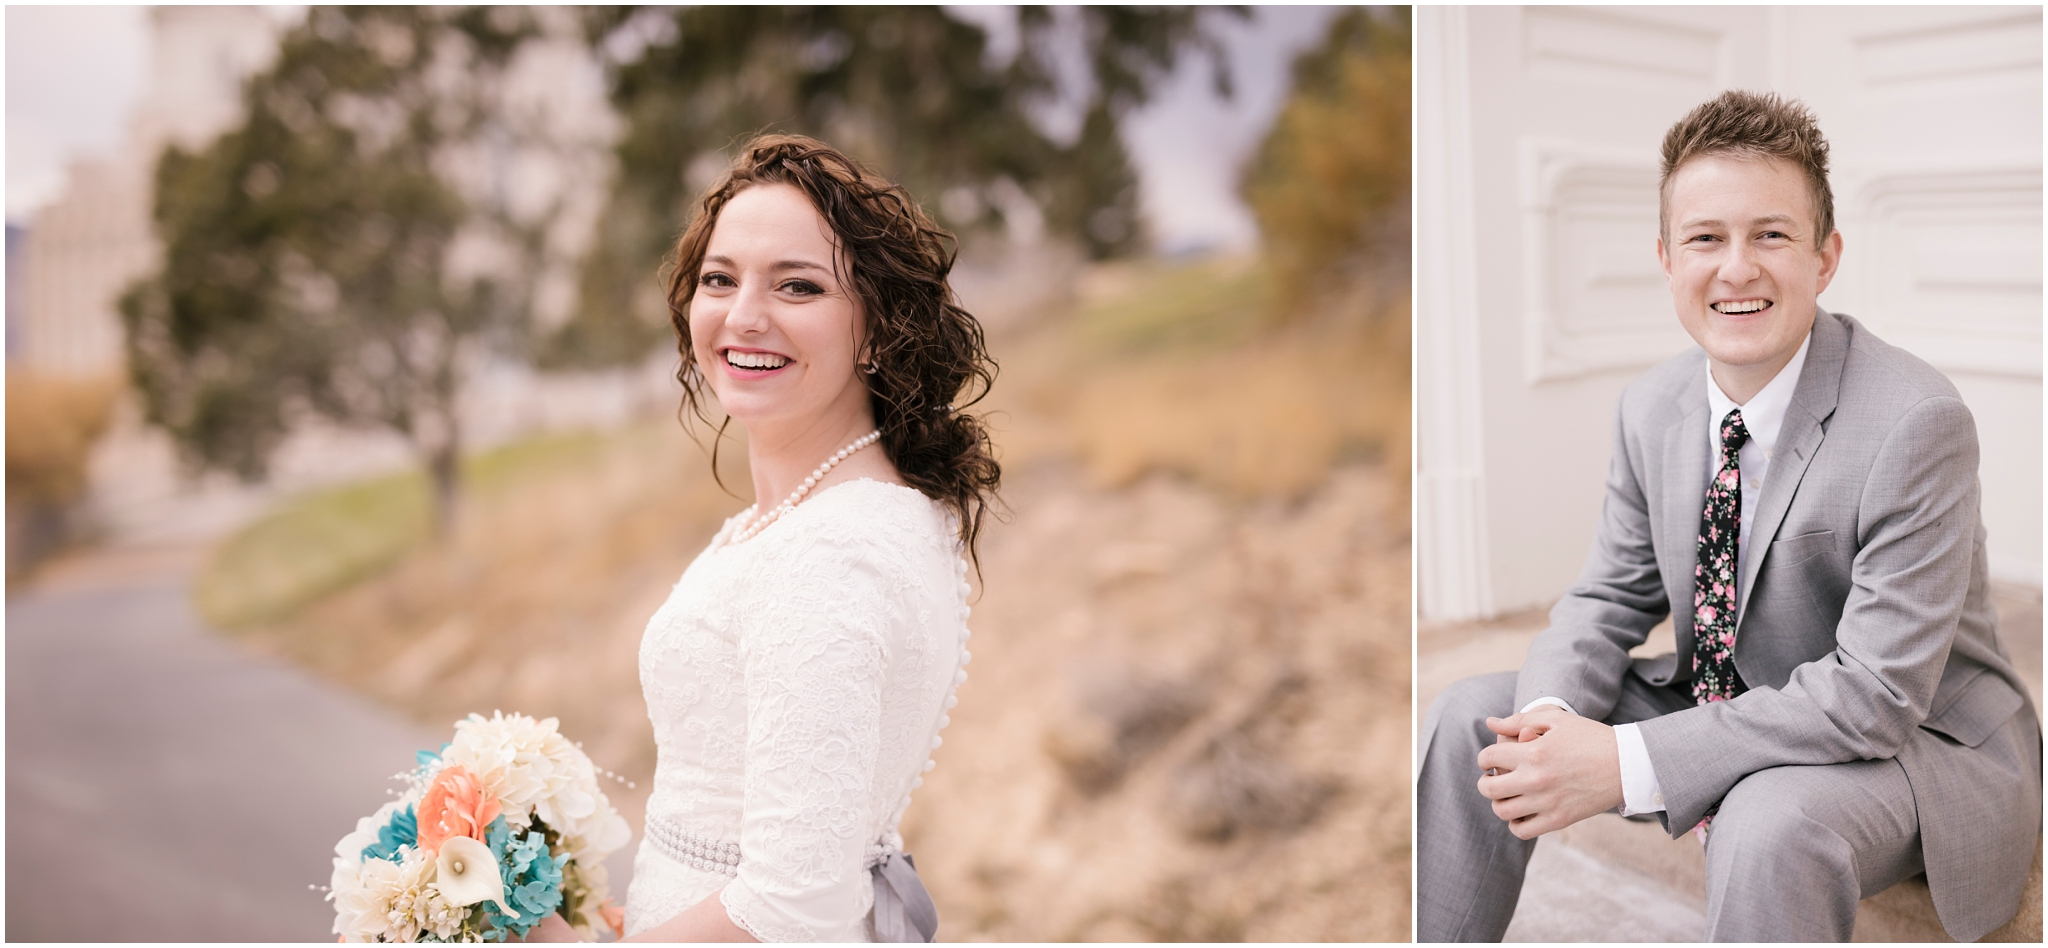 BA-Bridals-86_Lizzie-B-Imagery-Utah-Wedding-Photographer-Central-Utah-Photographer-Utah-County-Manti-Utah-Temple.jpg